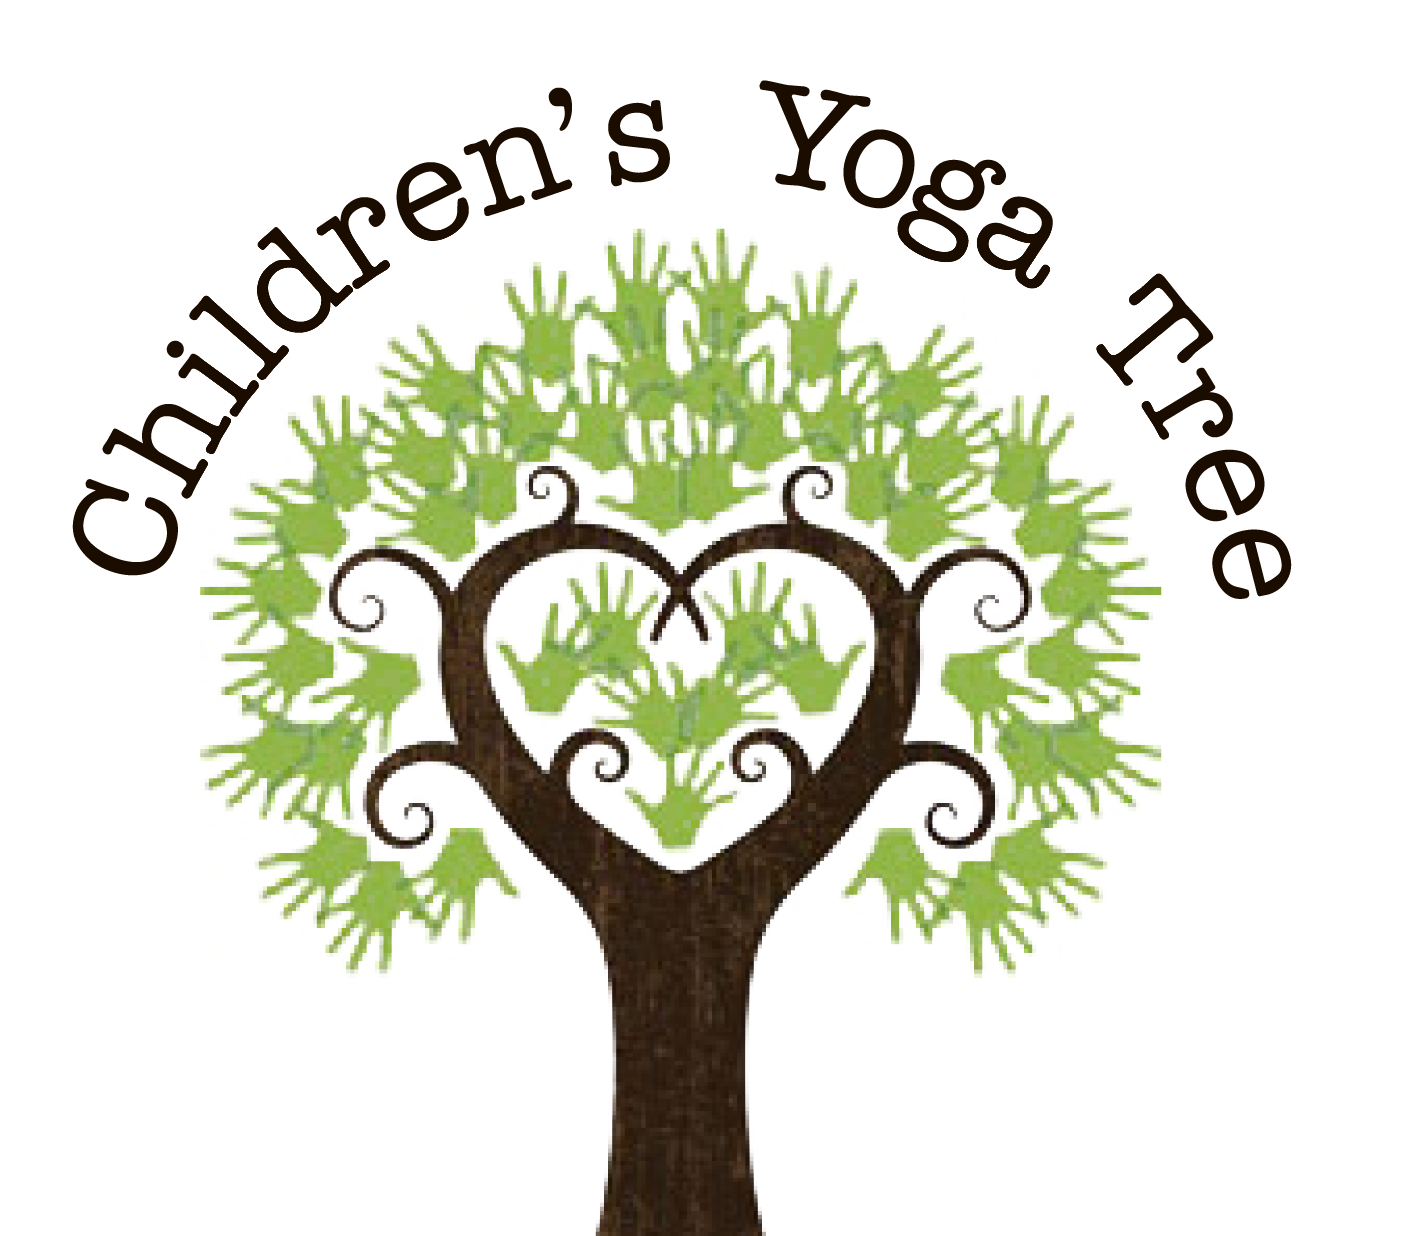 Emotions clipart teacher workshop. Childrens yoga tree training